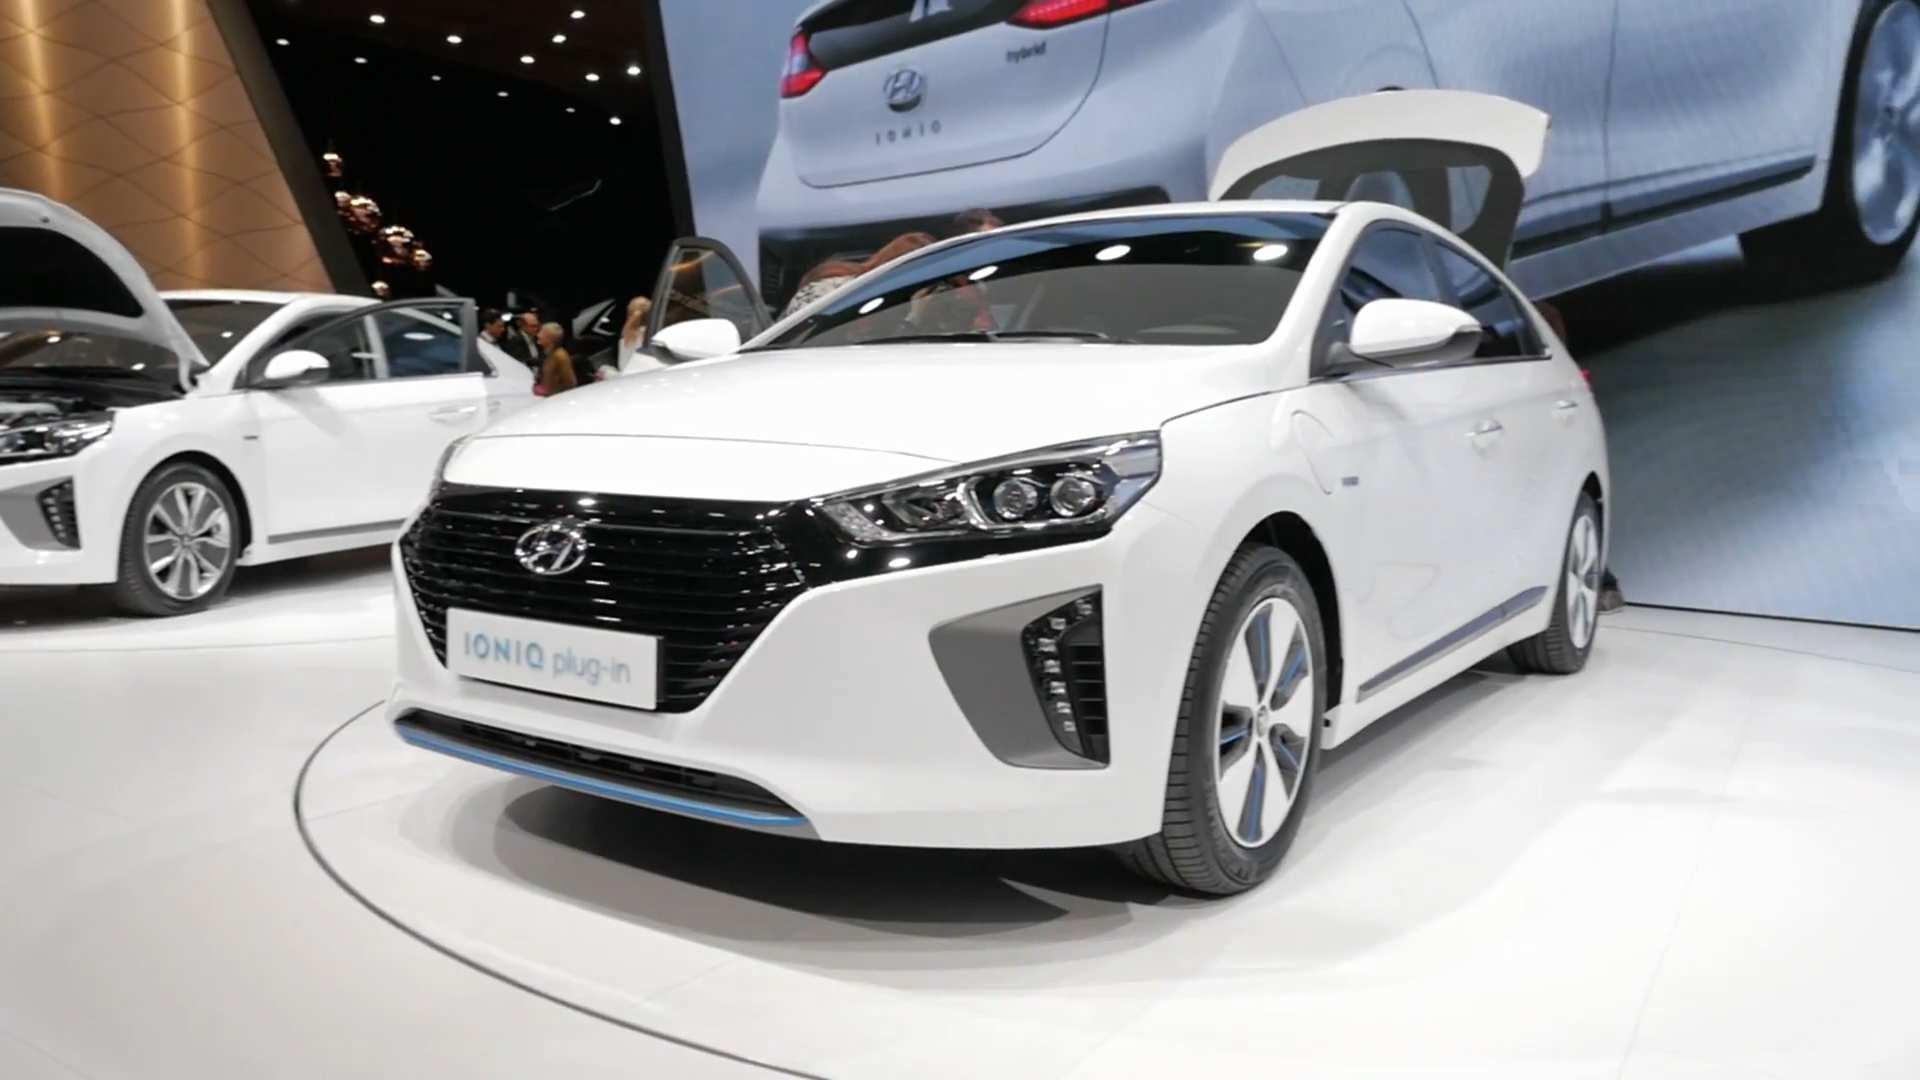 51 Great Hyundai Autonomous 2020 Prices for Hyundai Autonomous 2020